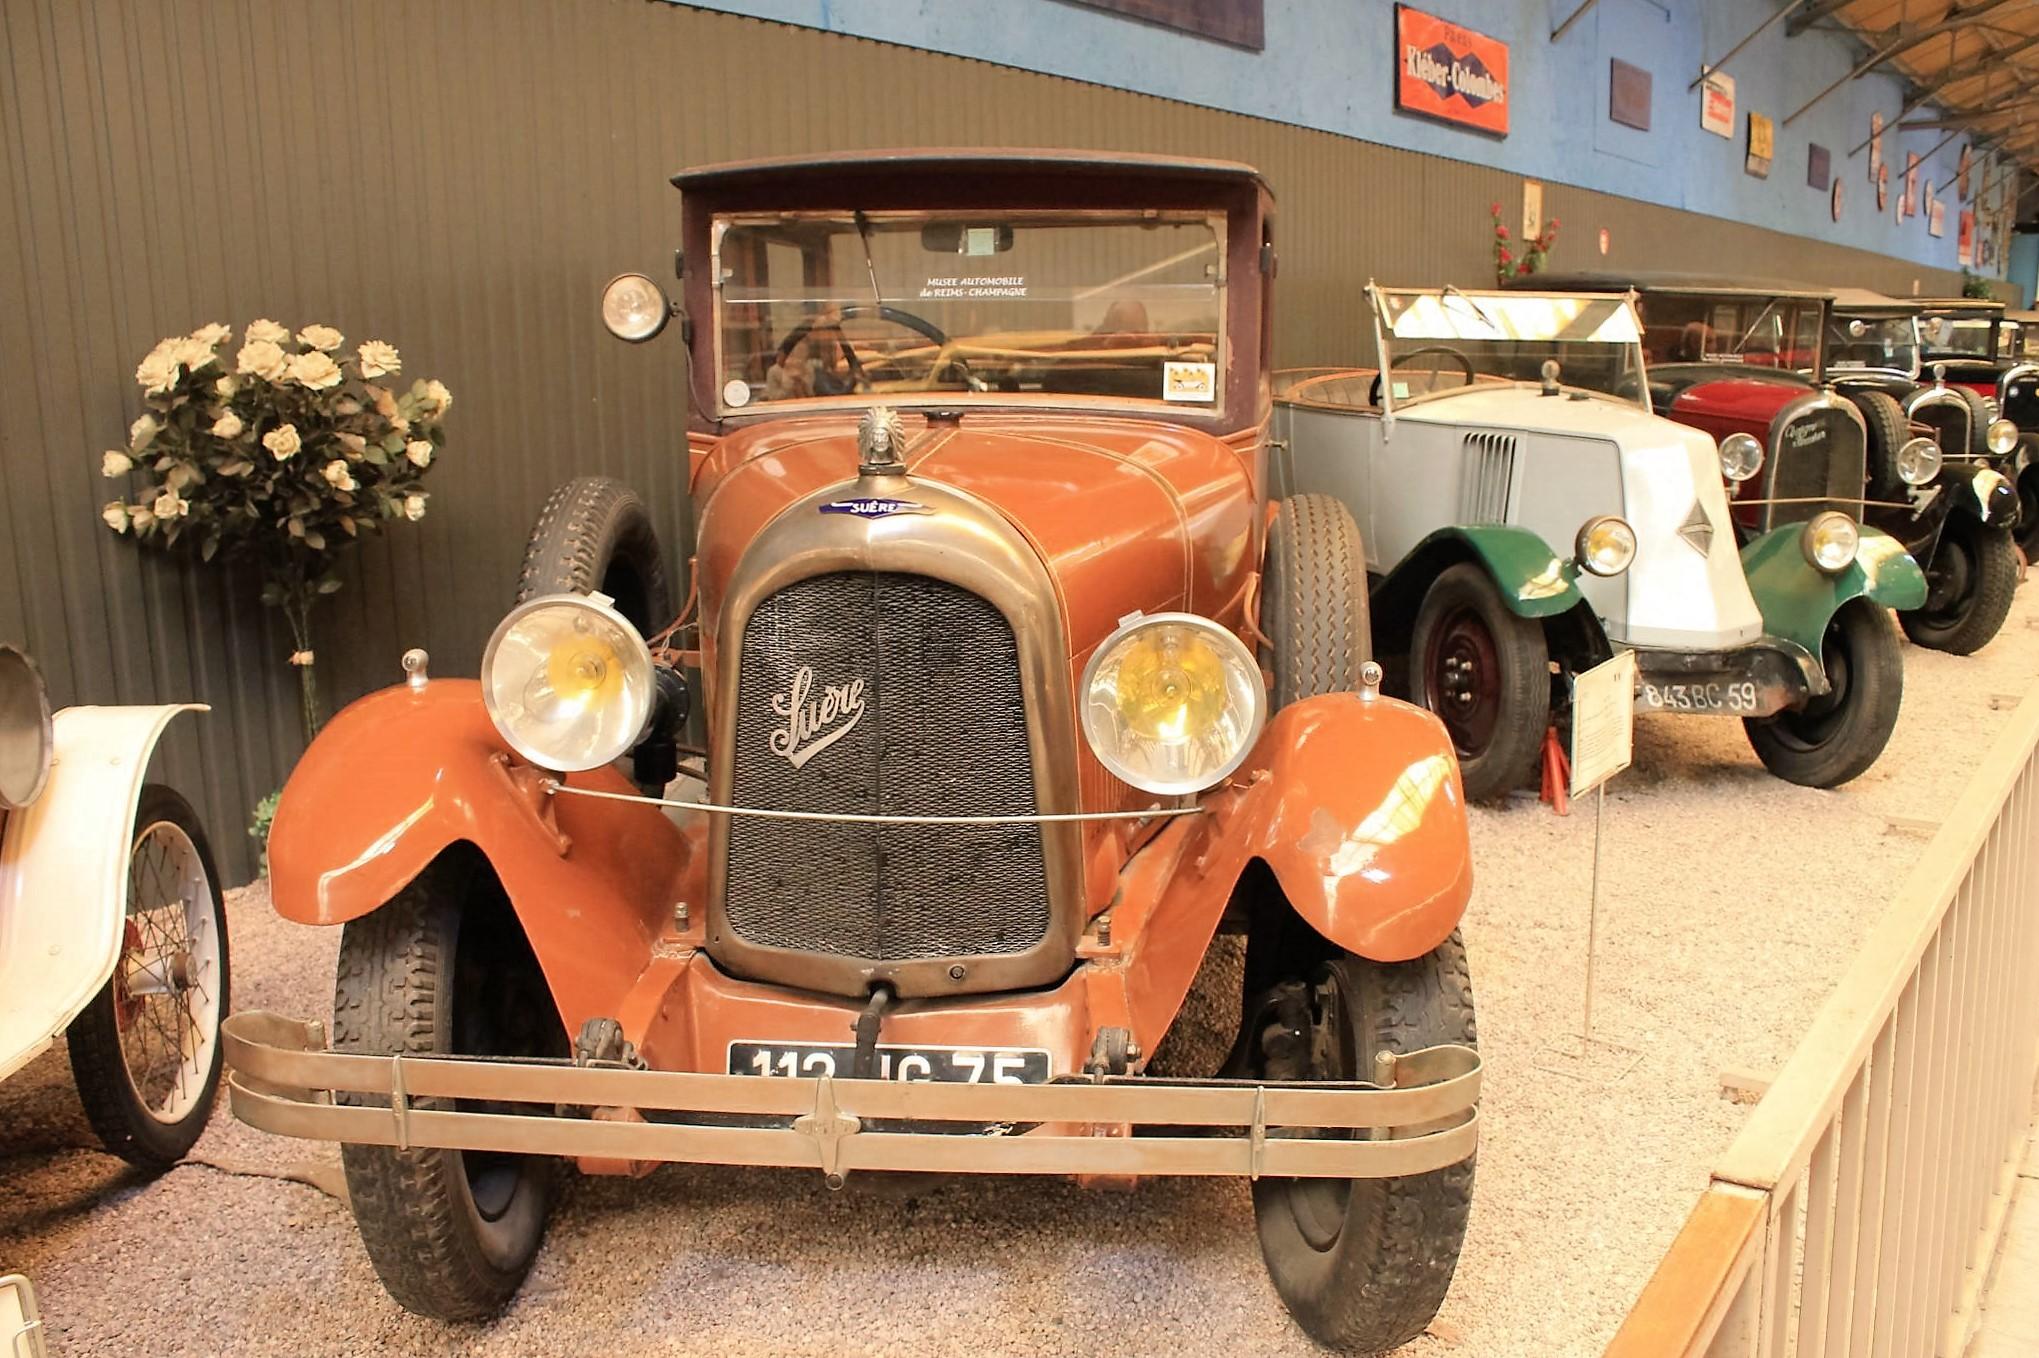 Musée automobile de Reims - 1925 Suere Type D Berline Landaulet